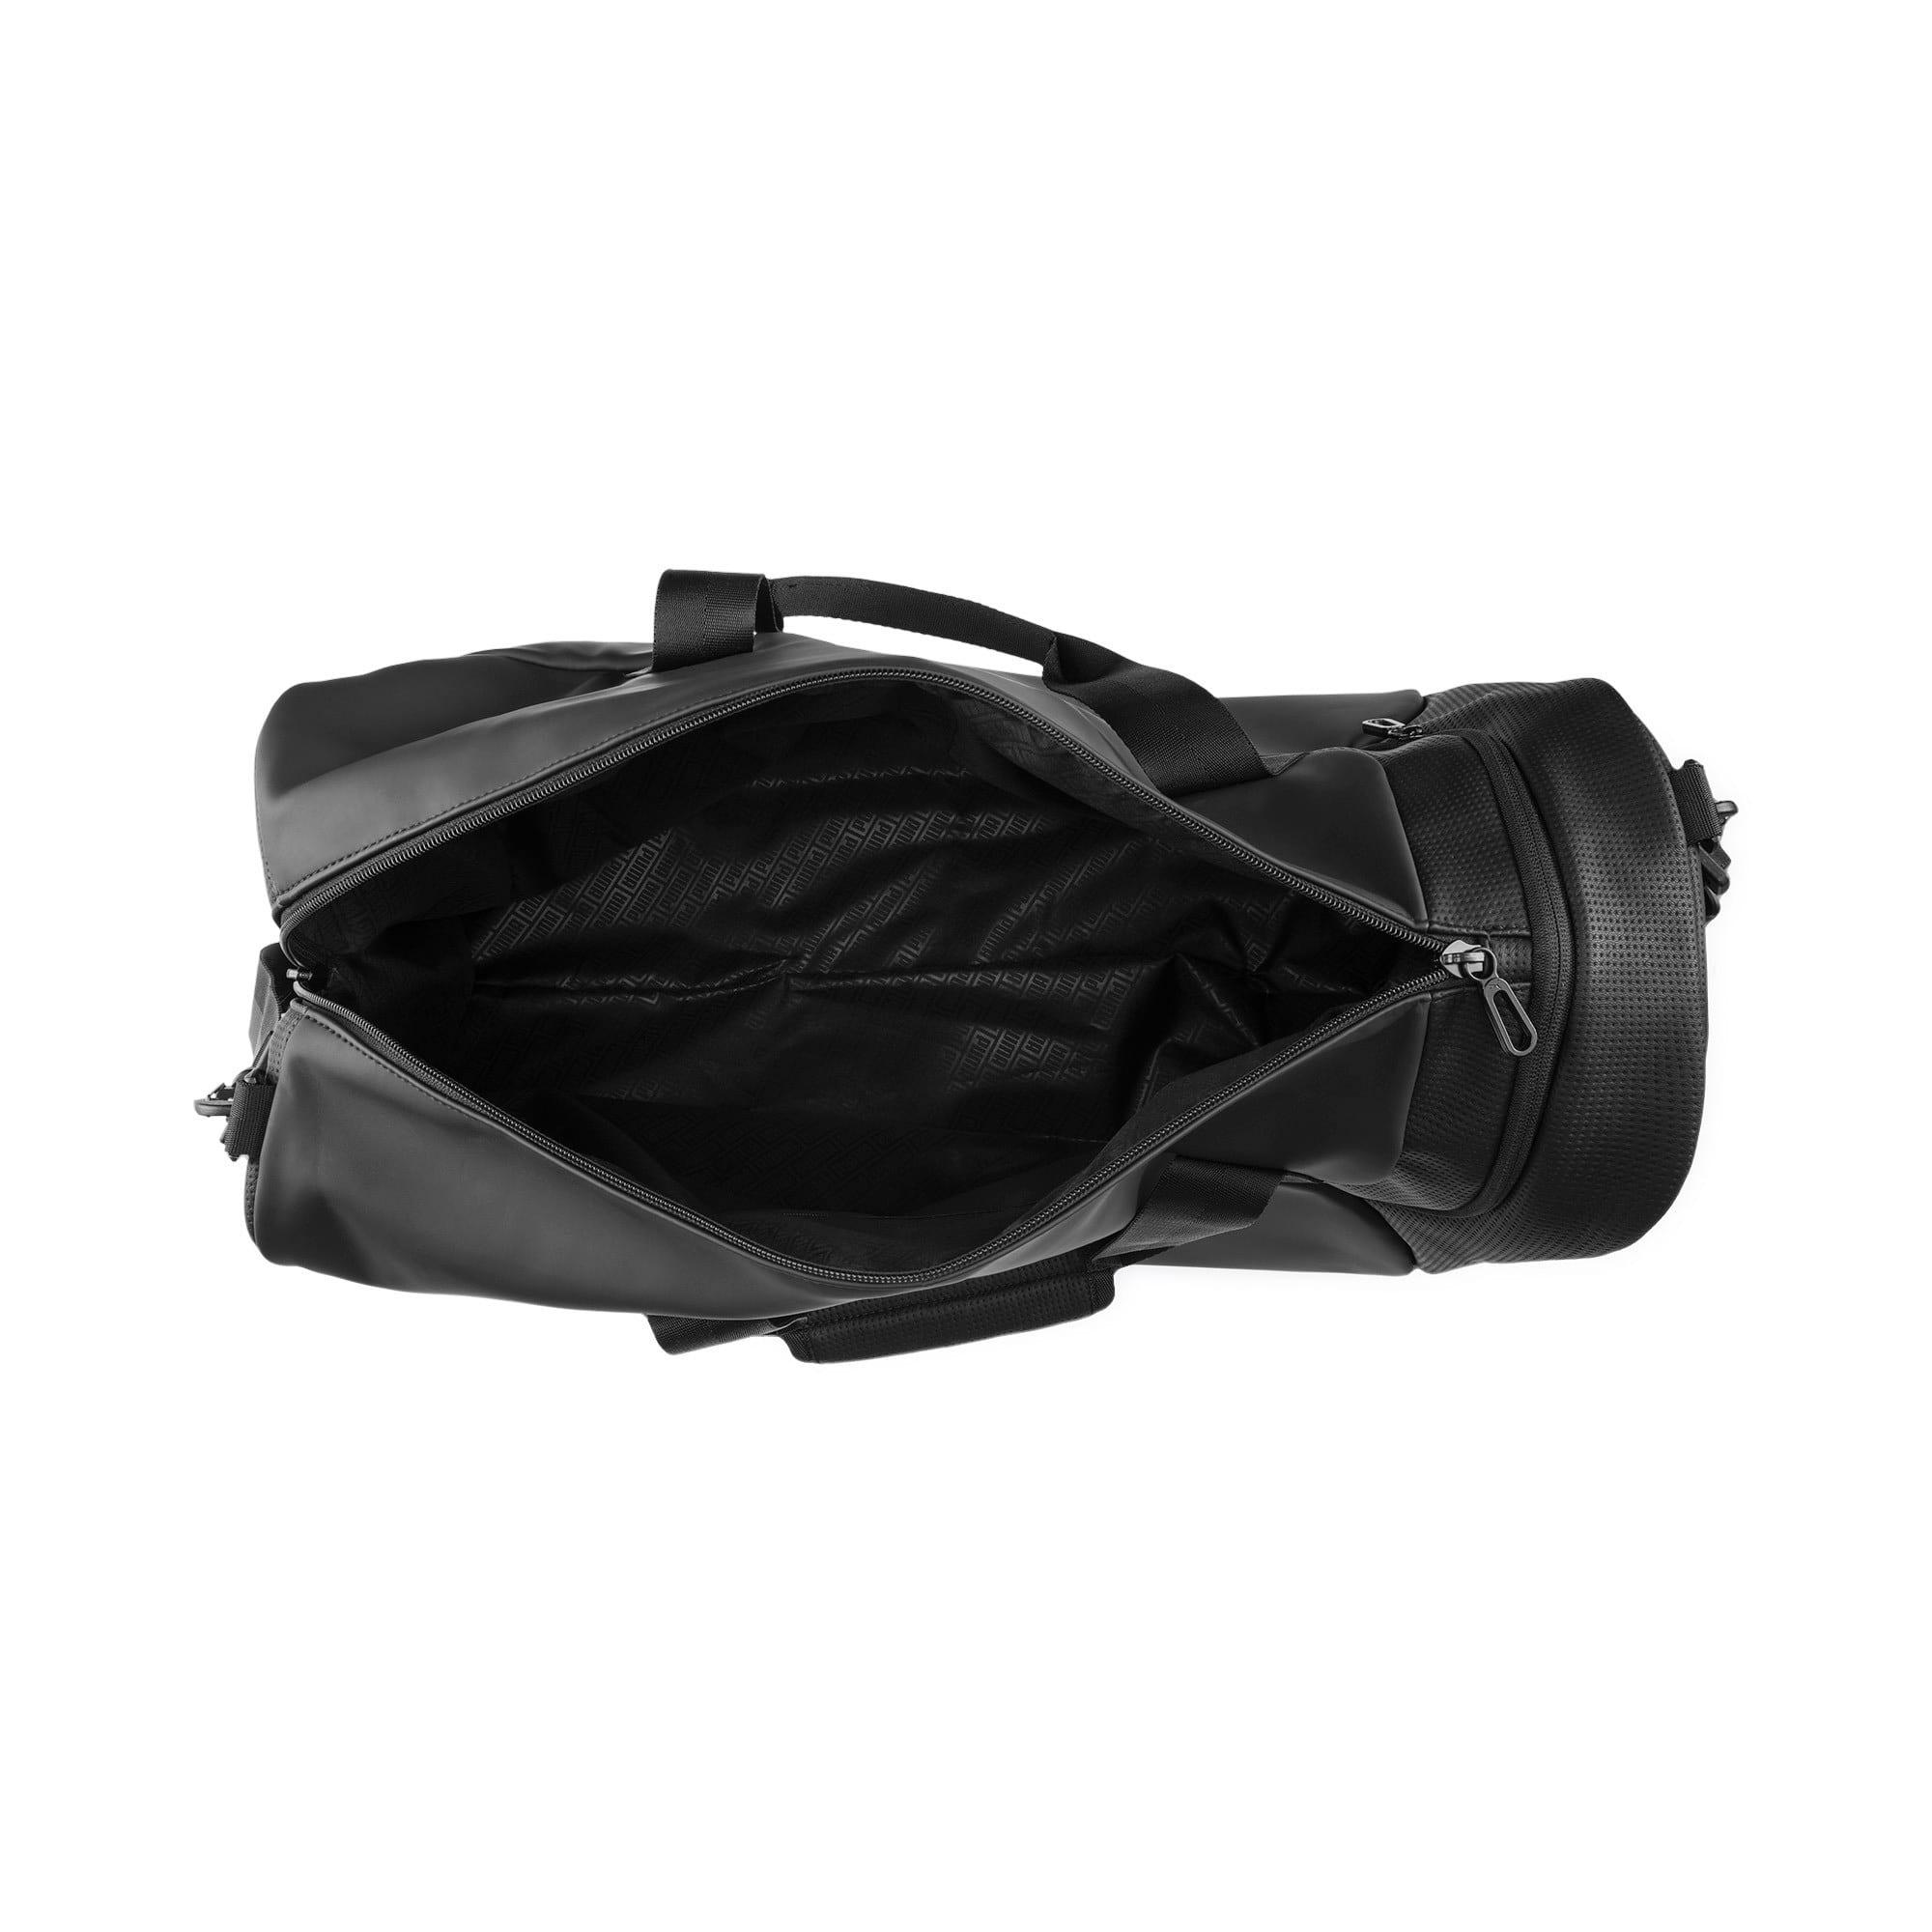 Thumbnail 4 of Ferrari Weekender Bag, Puma Black, medium-IND